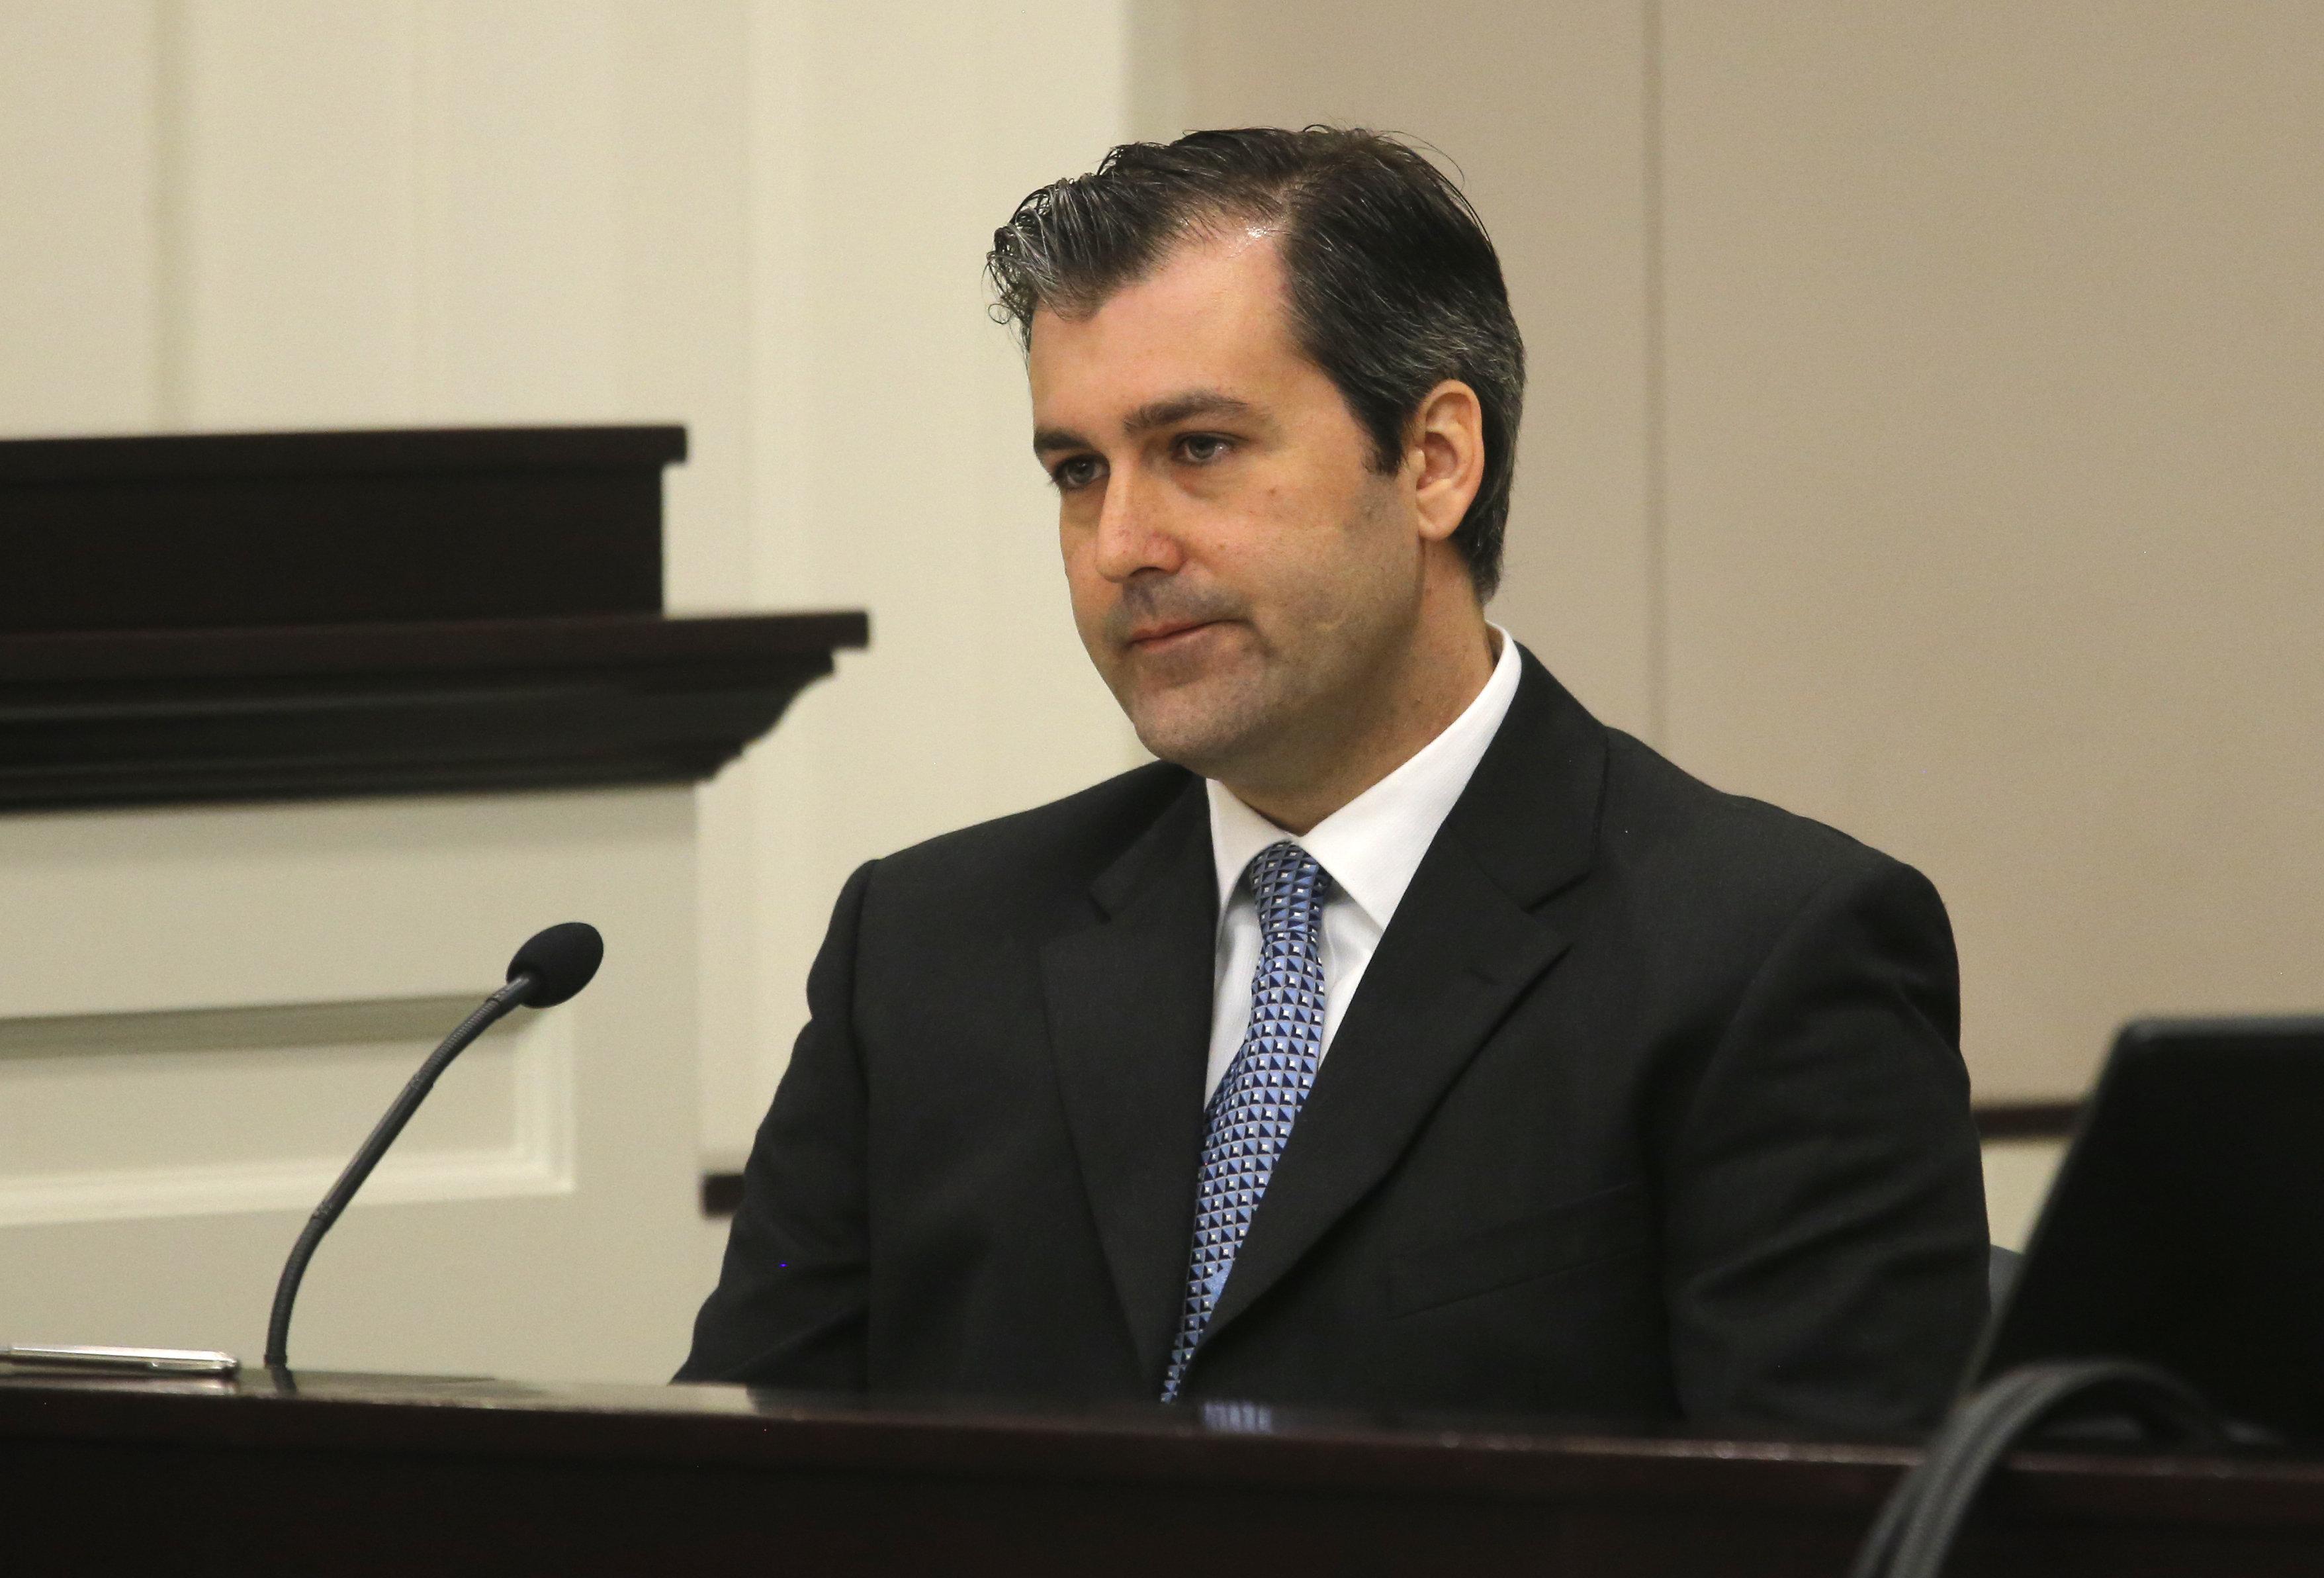 Michael Slager testified in court this week